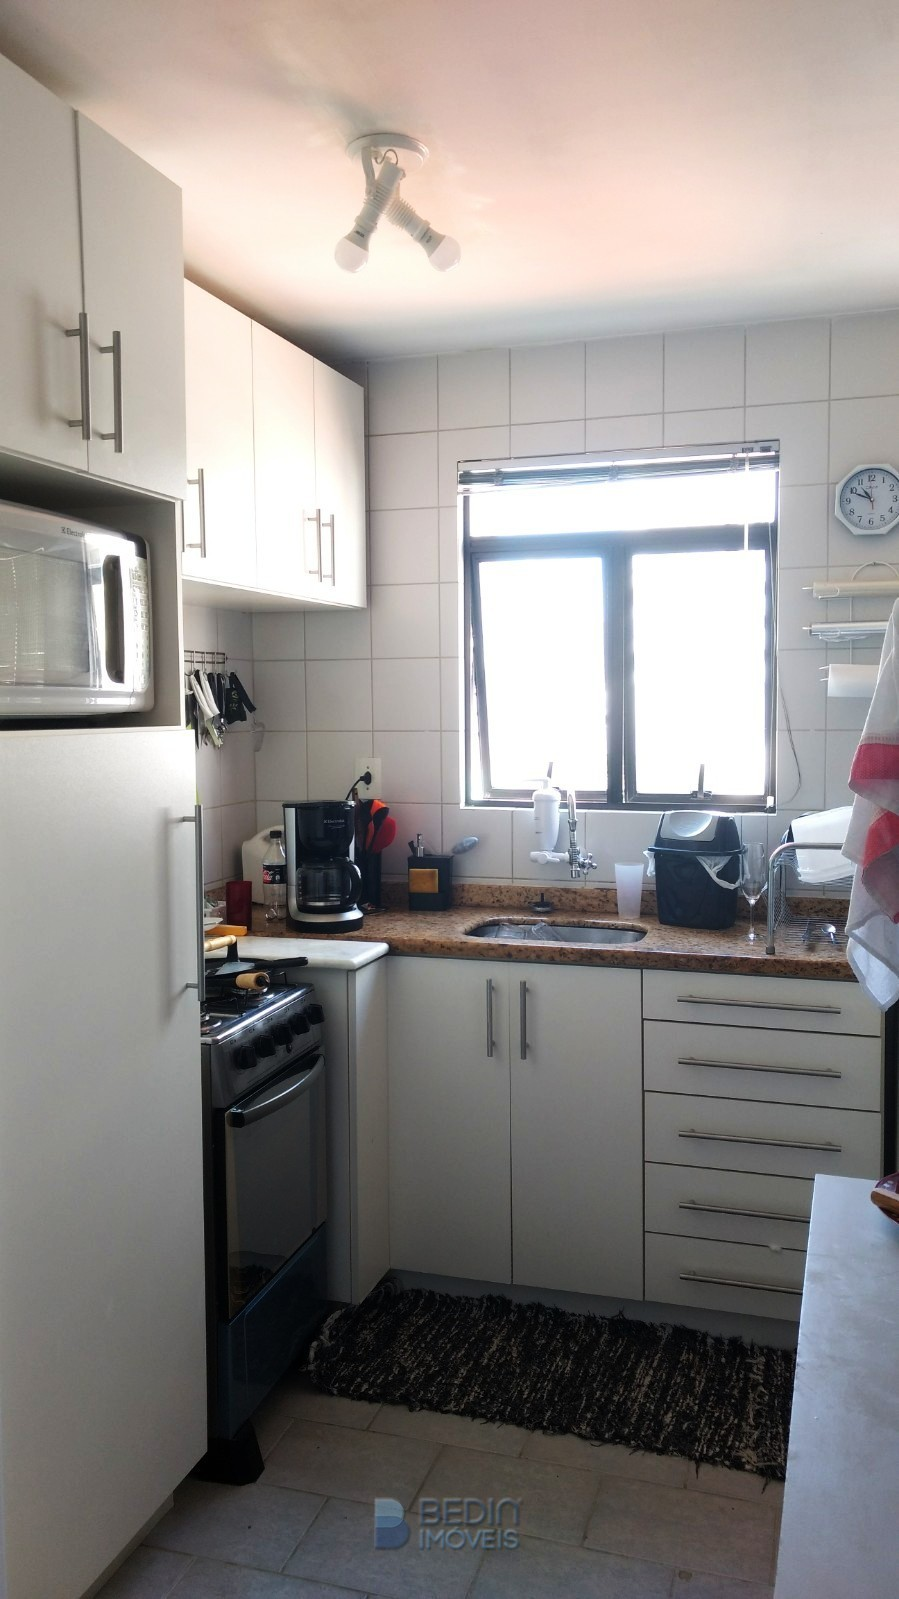 Bedin Imóveis -Apartamento